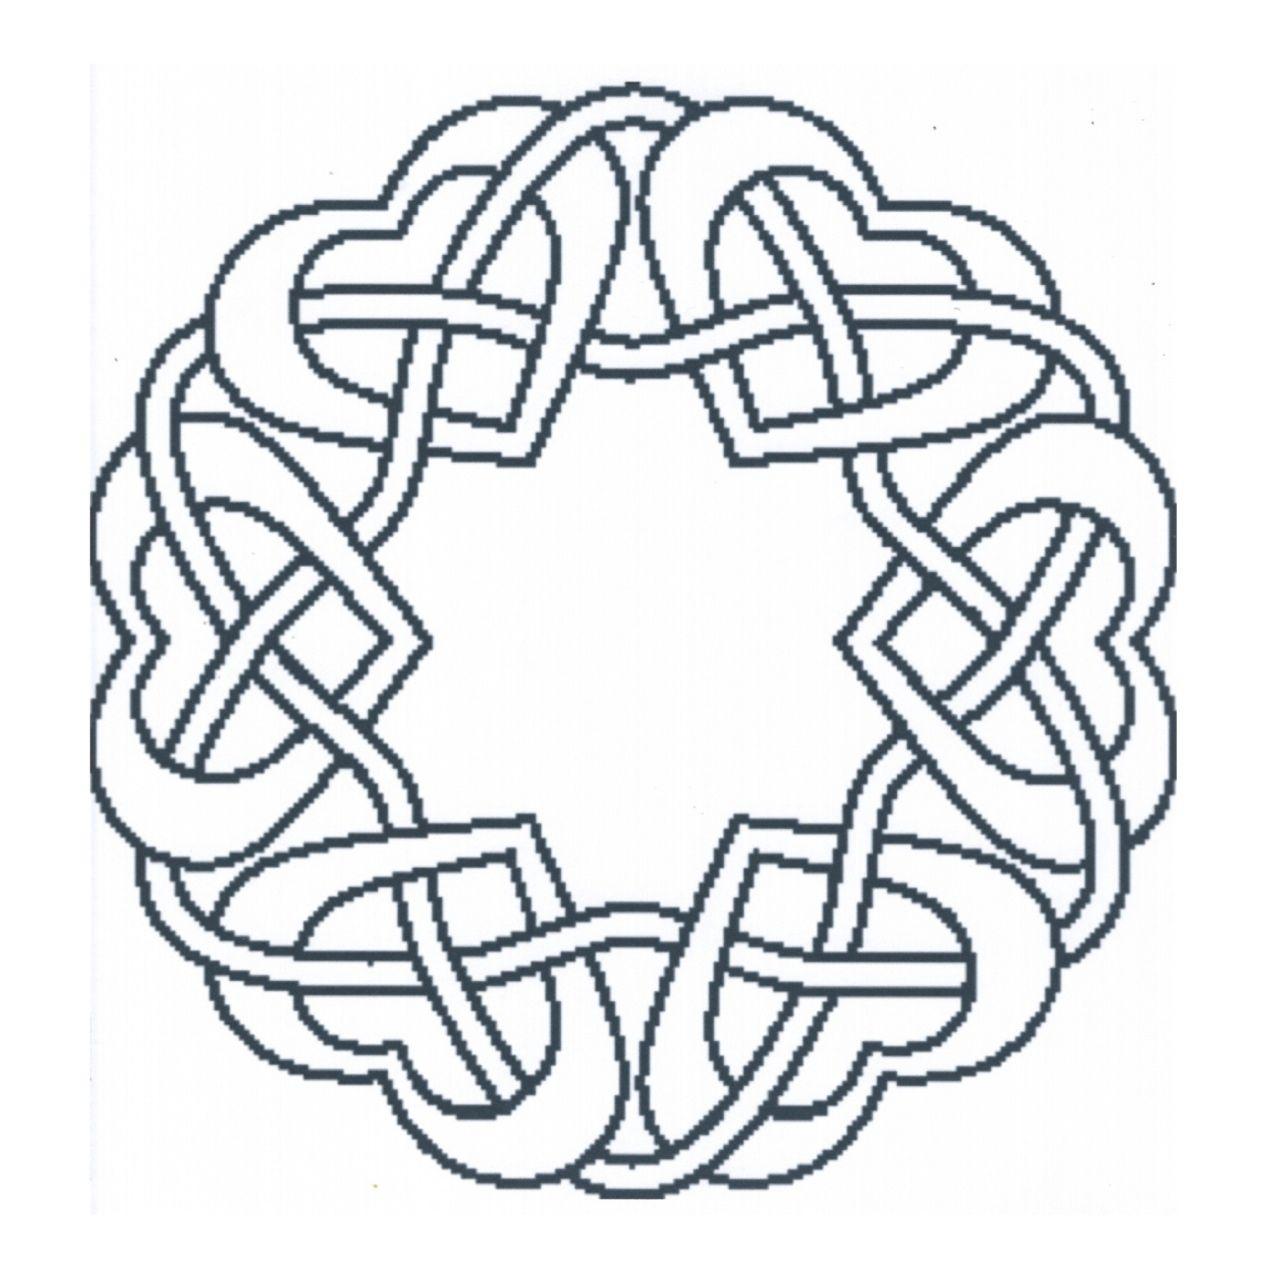 heart mandala   Diseños   Pinterest   Mandalas, Dibujo y Puntillismo